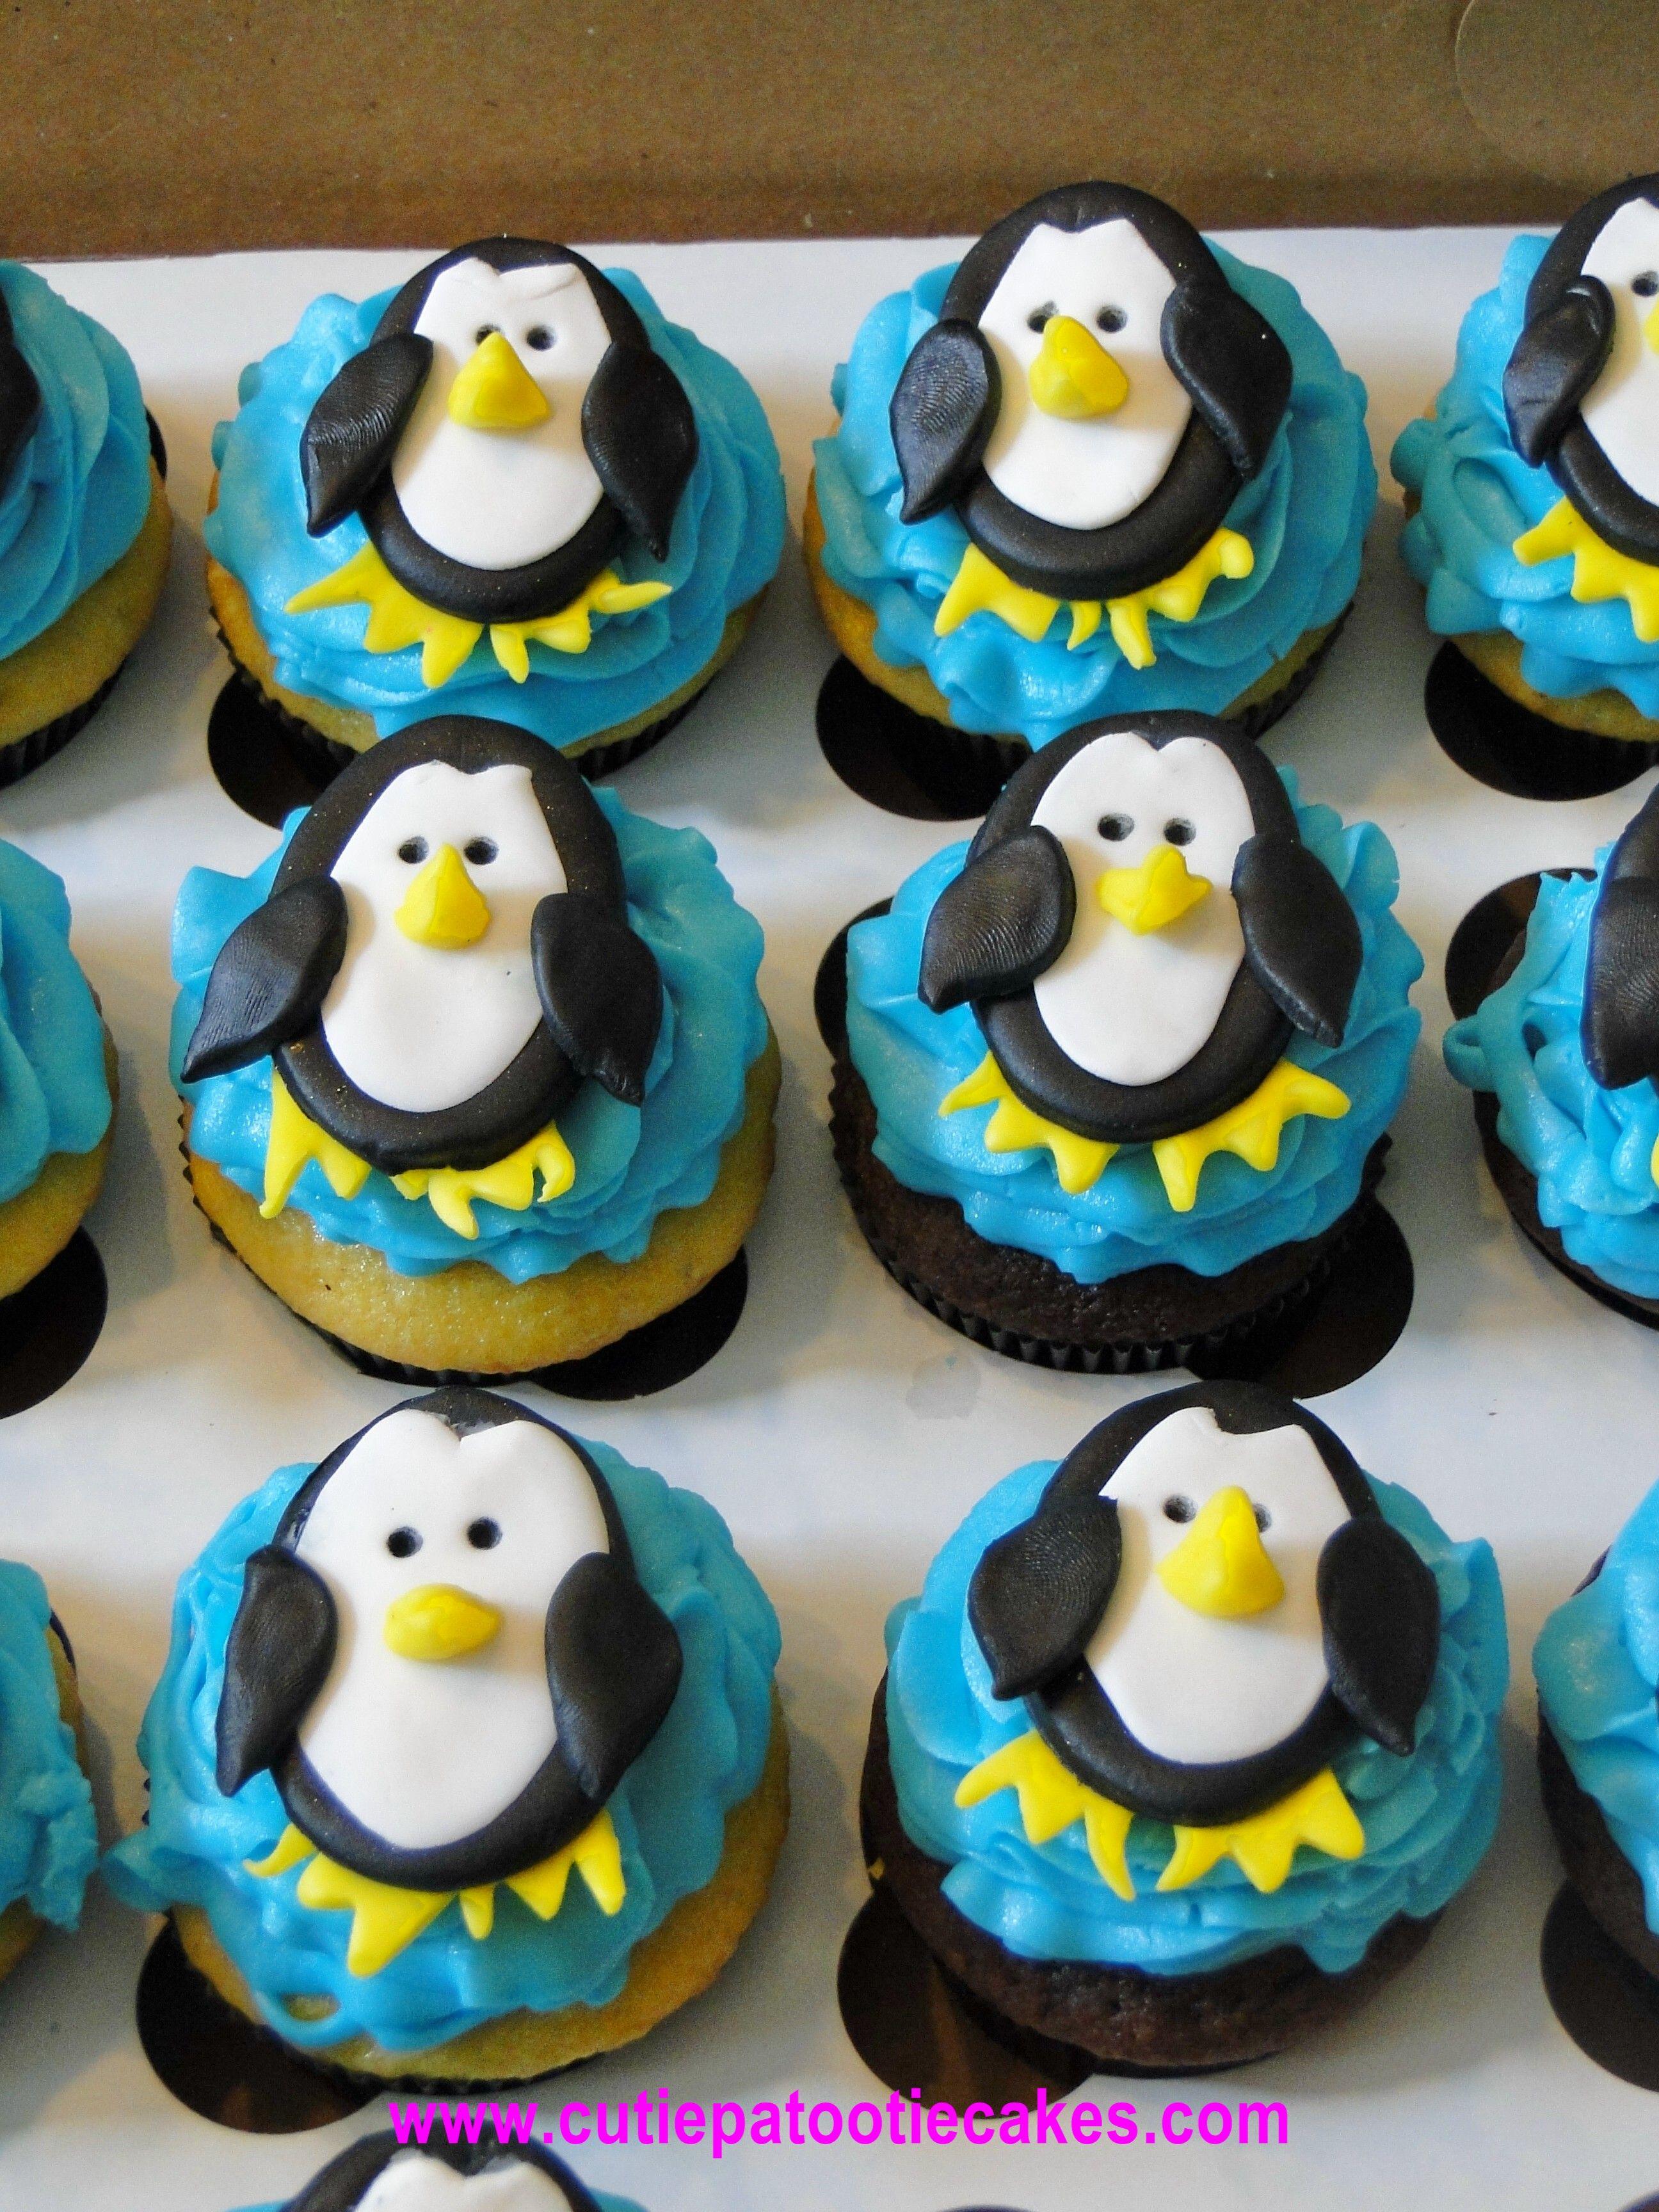 Pinguin Cupcakes Essen Ideen Getränk Pinguine Bachelorette Ideas Can s Bridal Shower